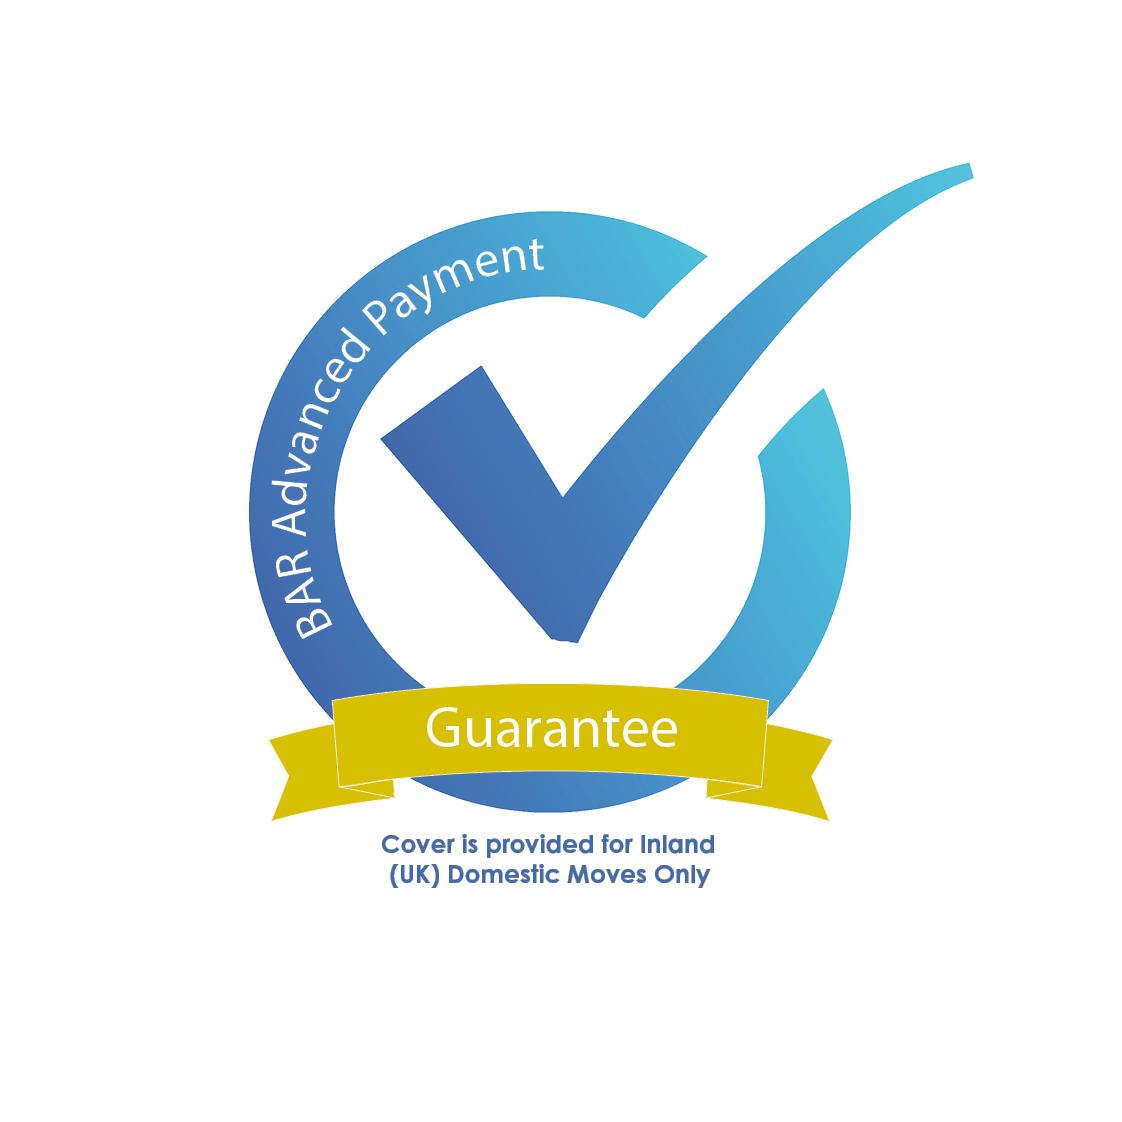 BAR Final APG Logo - Inland UK Domestic Moves